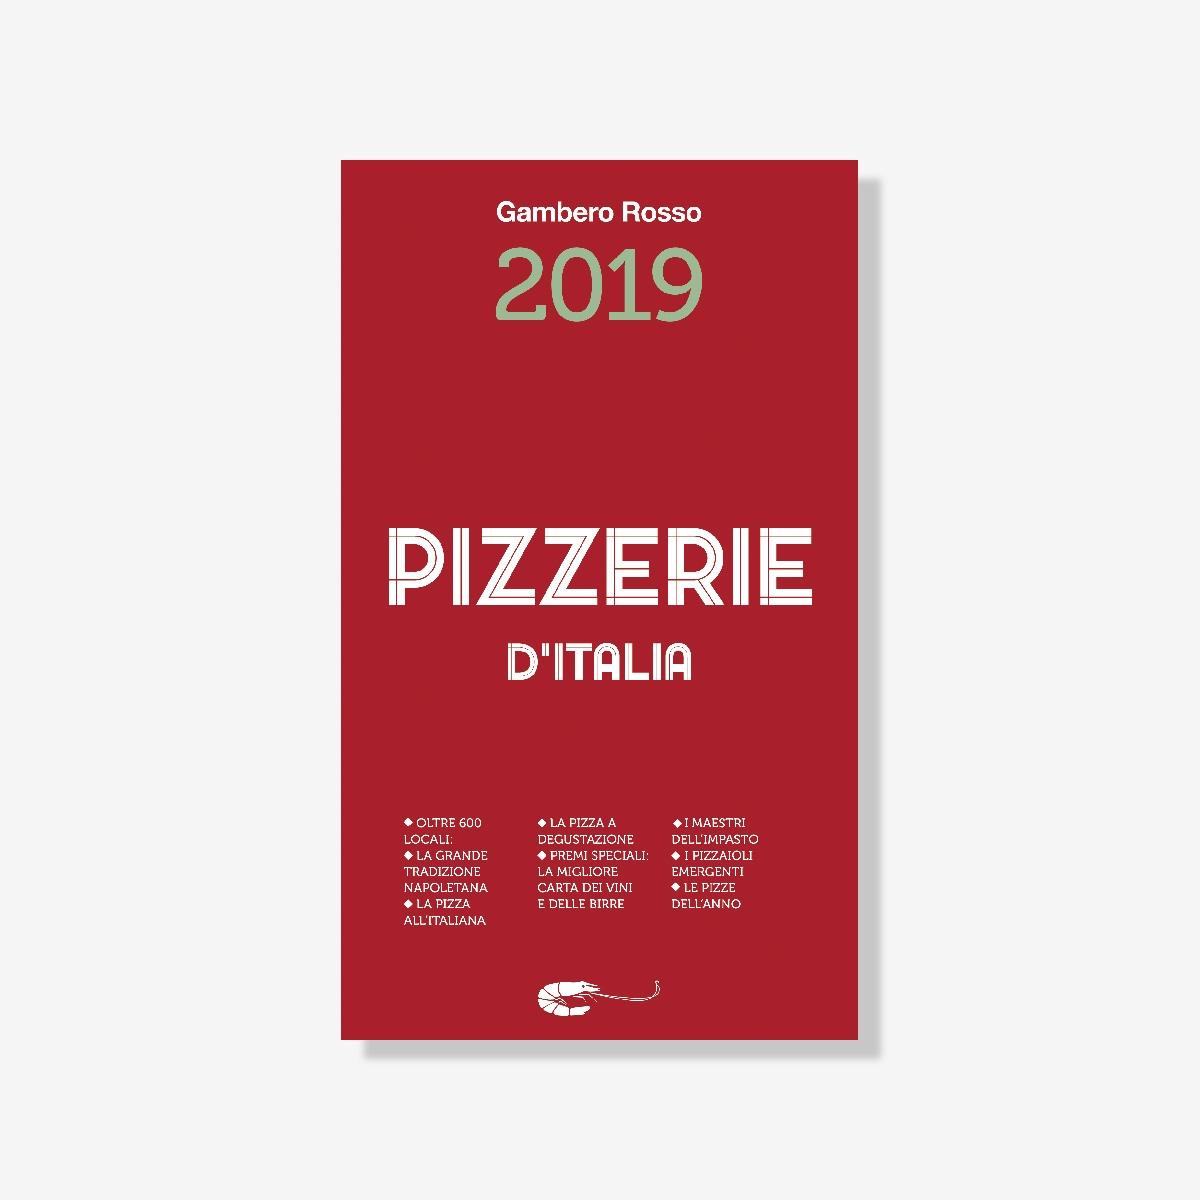 pizzerie-2019-farina-pesaro